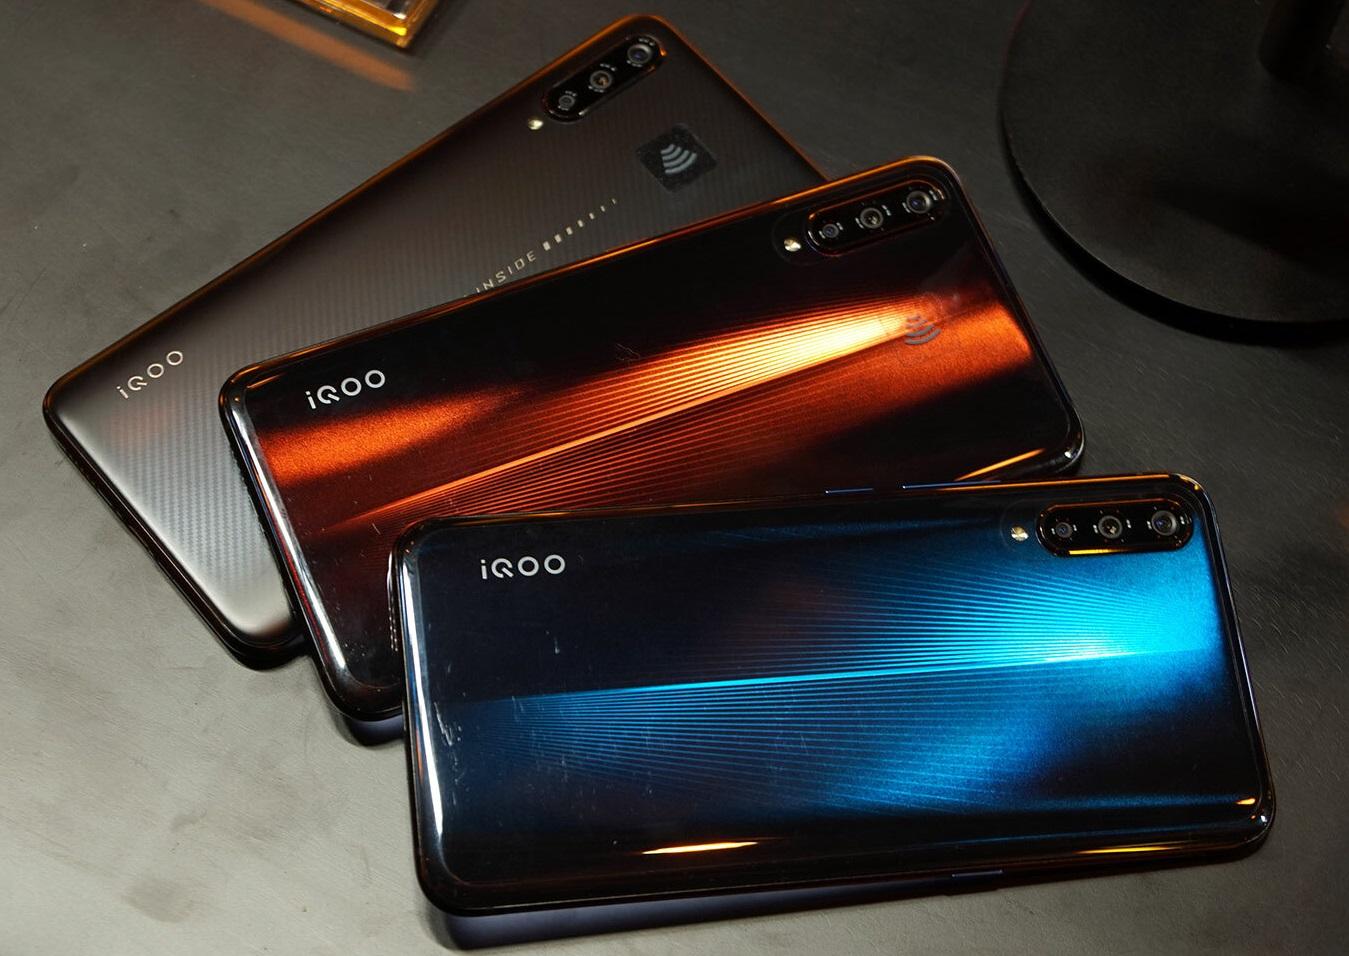 Harga dan Spesifikasi Smartphone Vivo iQOO